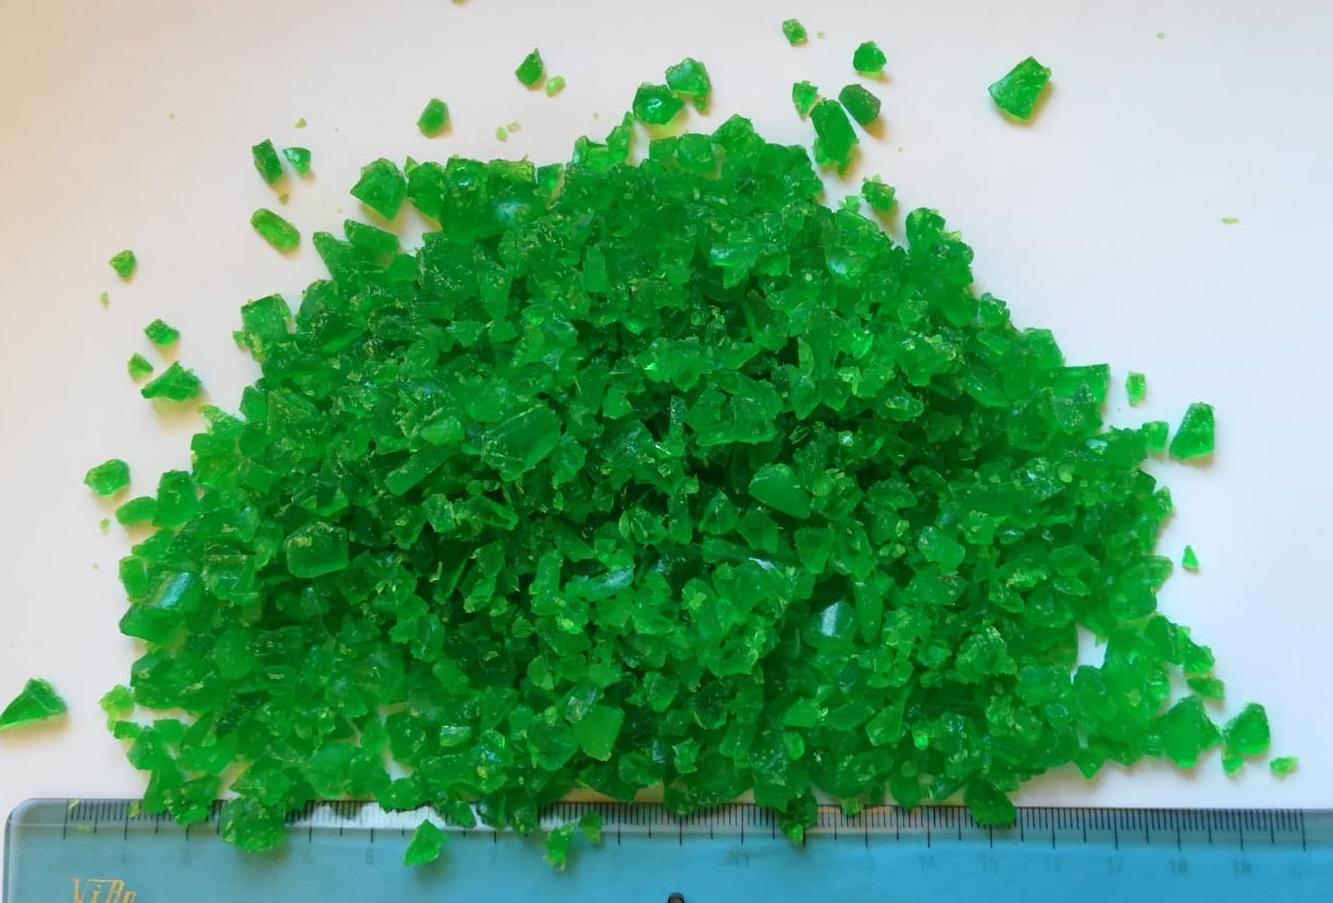 PLA regrind bottle grade green color PLA macinato da preforme verde PLA Mahlgut grüne Farbe PLA molido color verde PLA broyé vert